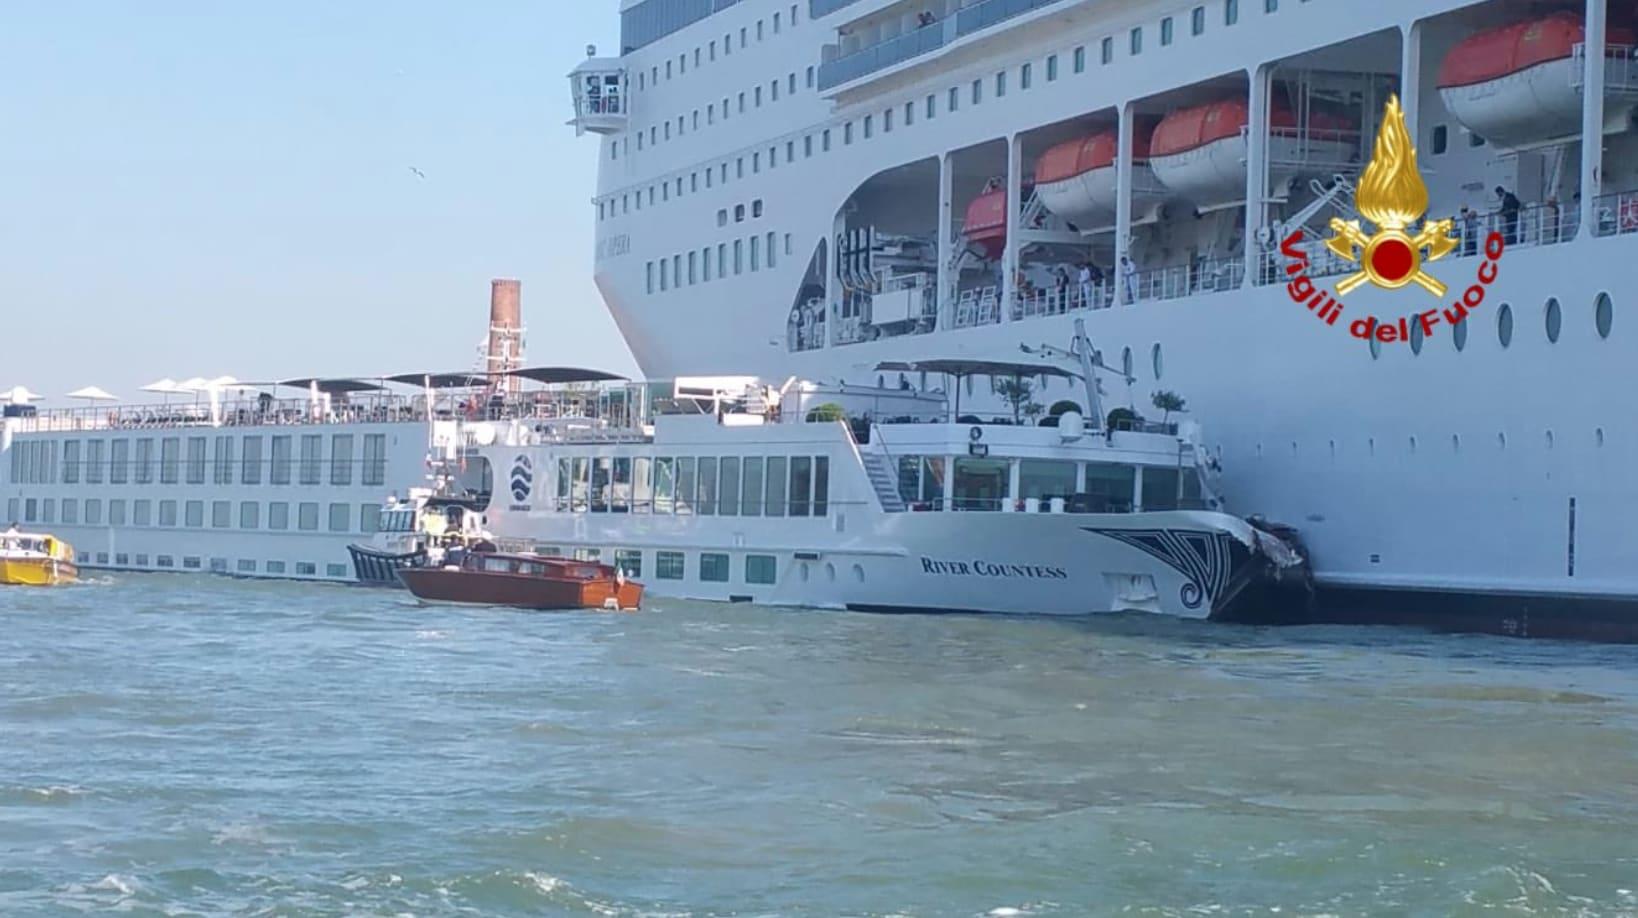 MSCオペラ、ベネチアで小型船に衝突